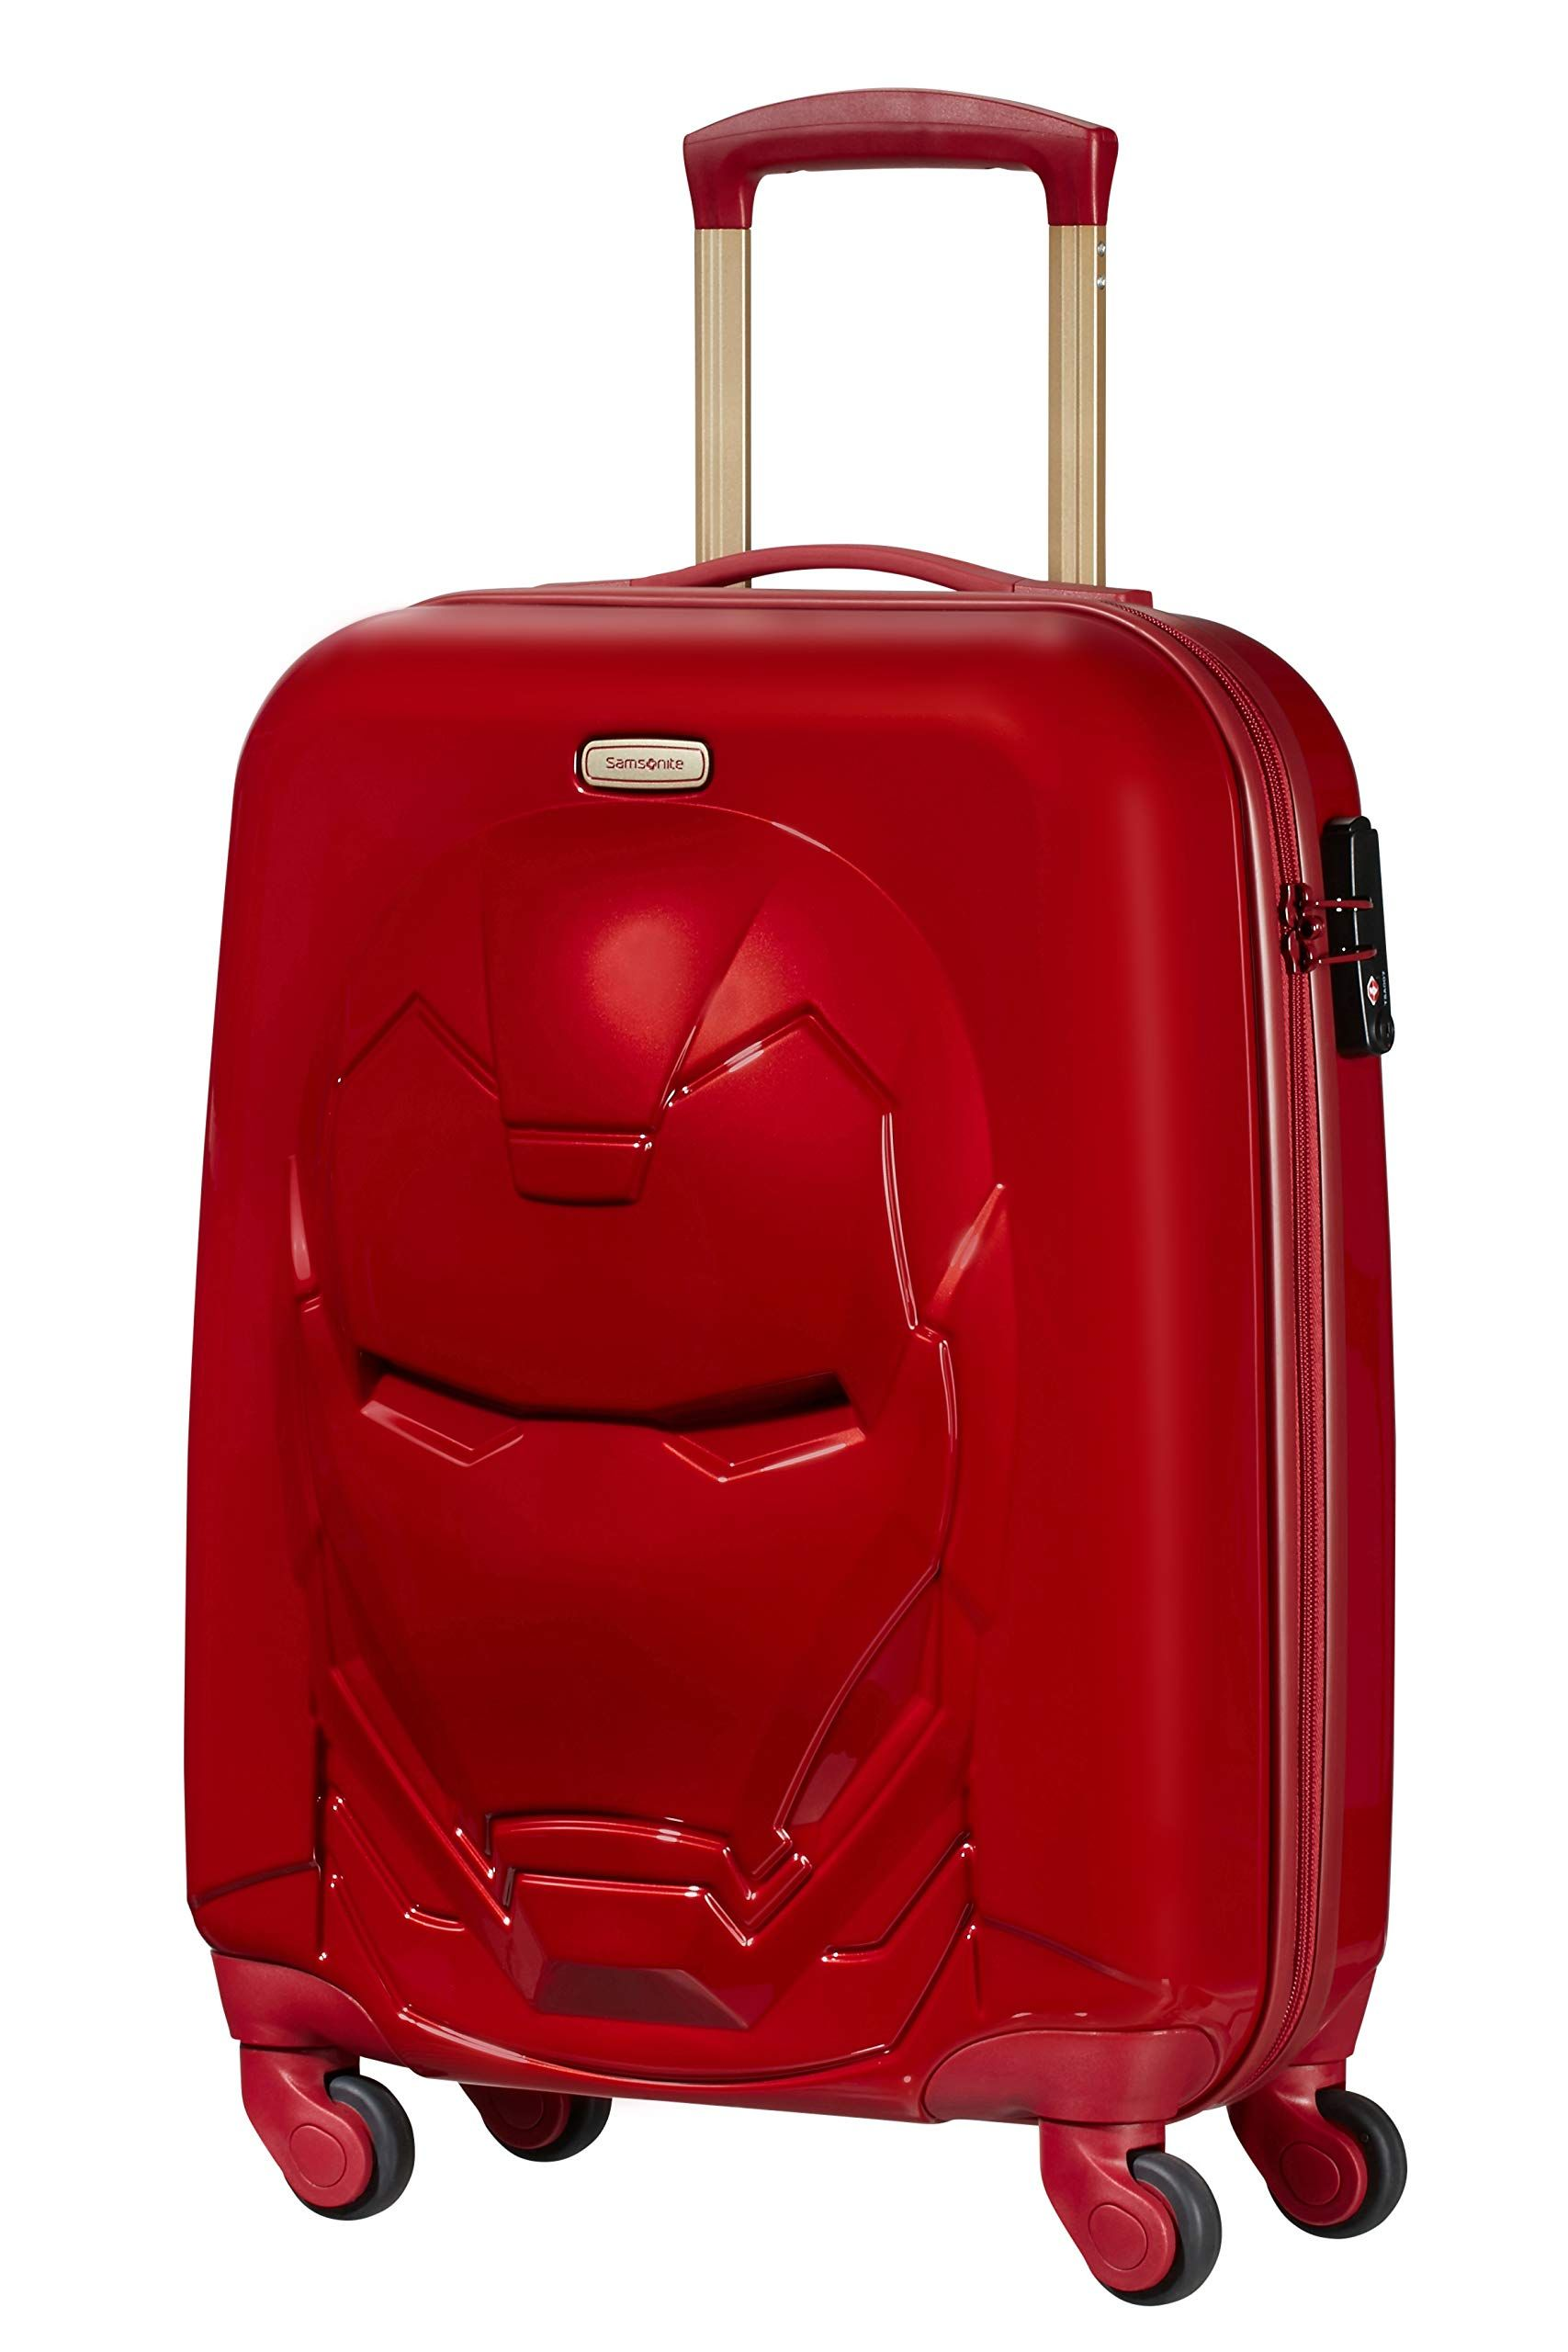 Samsonite Disney Ultimate 2 0 Hand Luggage 55 Cm 35 5 Litre Red Iron Man Red Top Luggage Uk Suitcase Samsonite Disney Suitcase